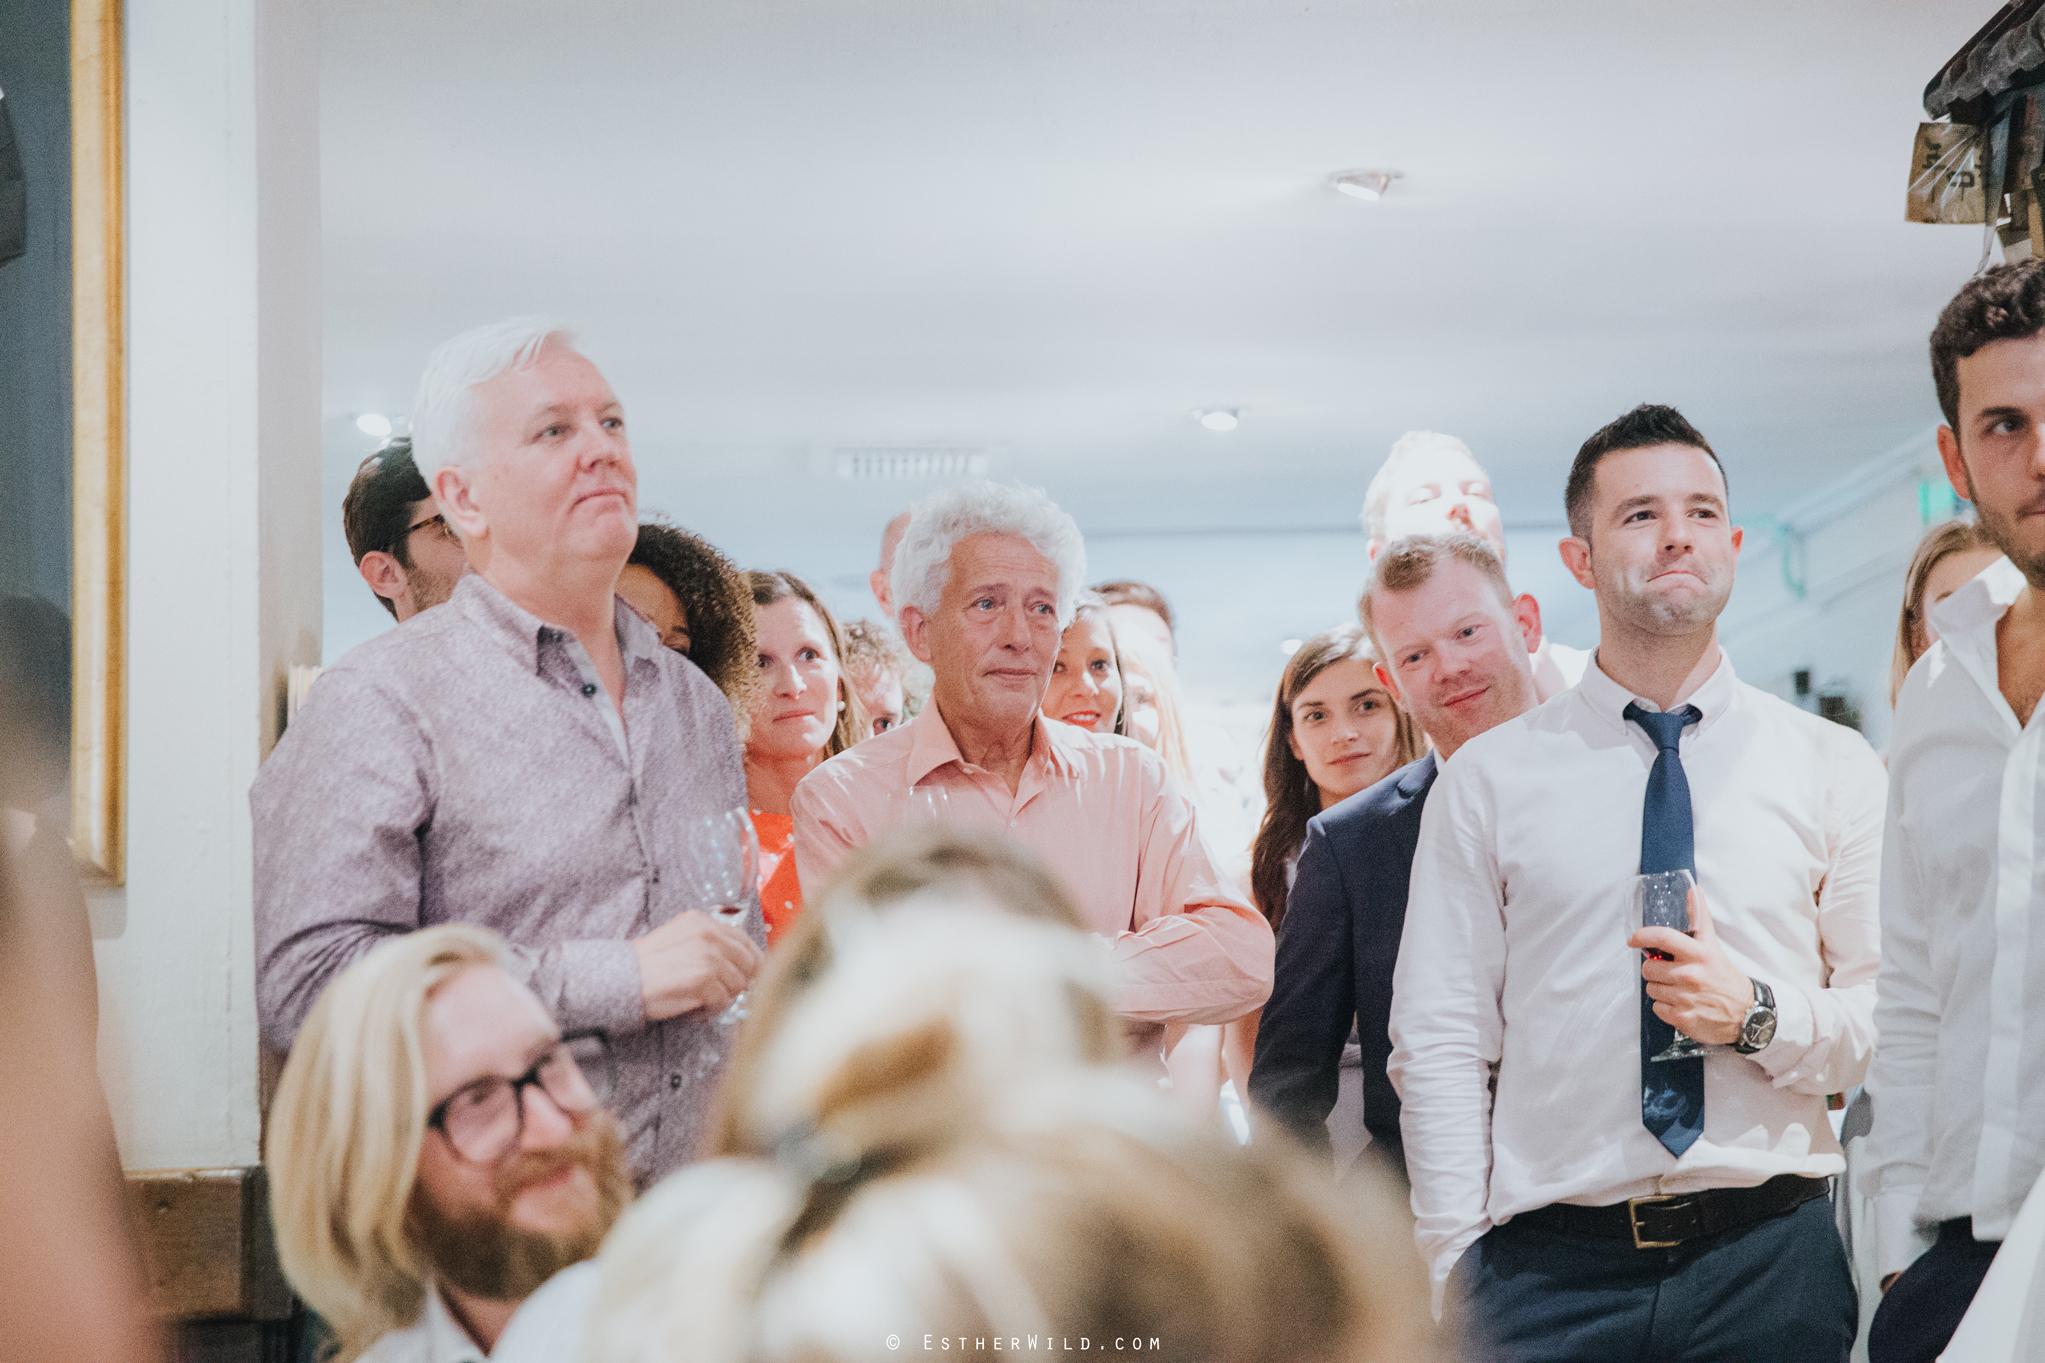 Islington_Town_Hall_Wedding_London_Photographer_Esther_Wild_IMG_6283.jpg